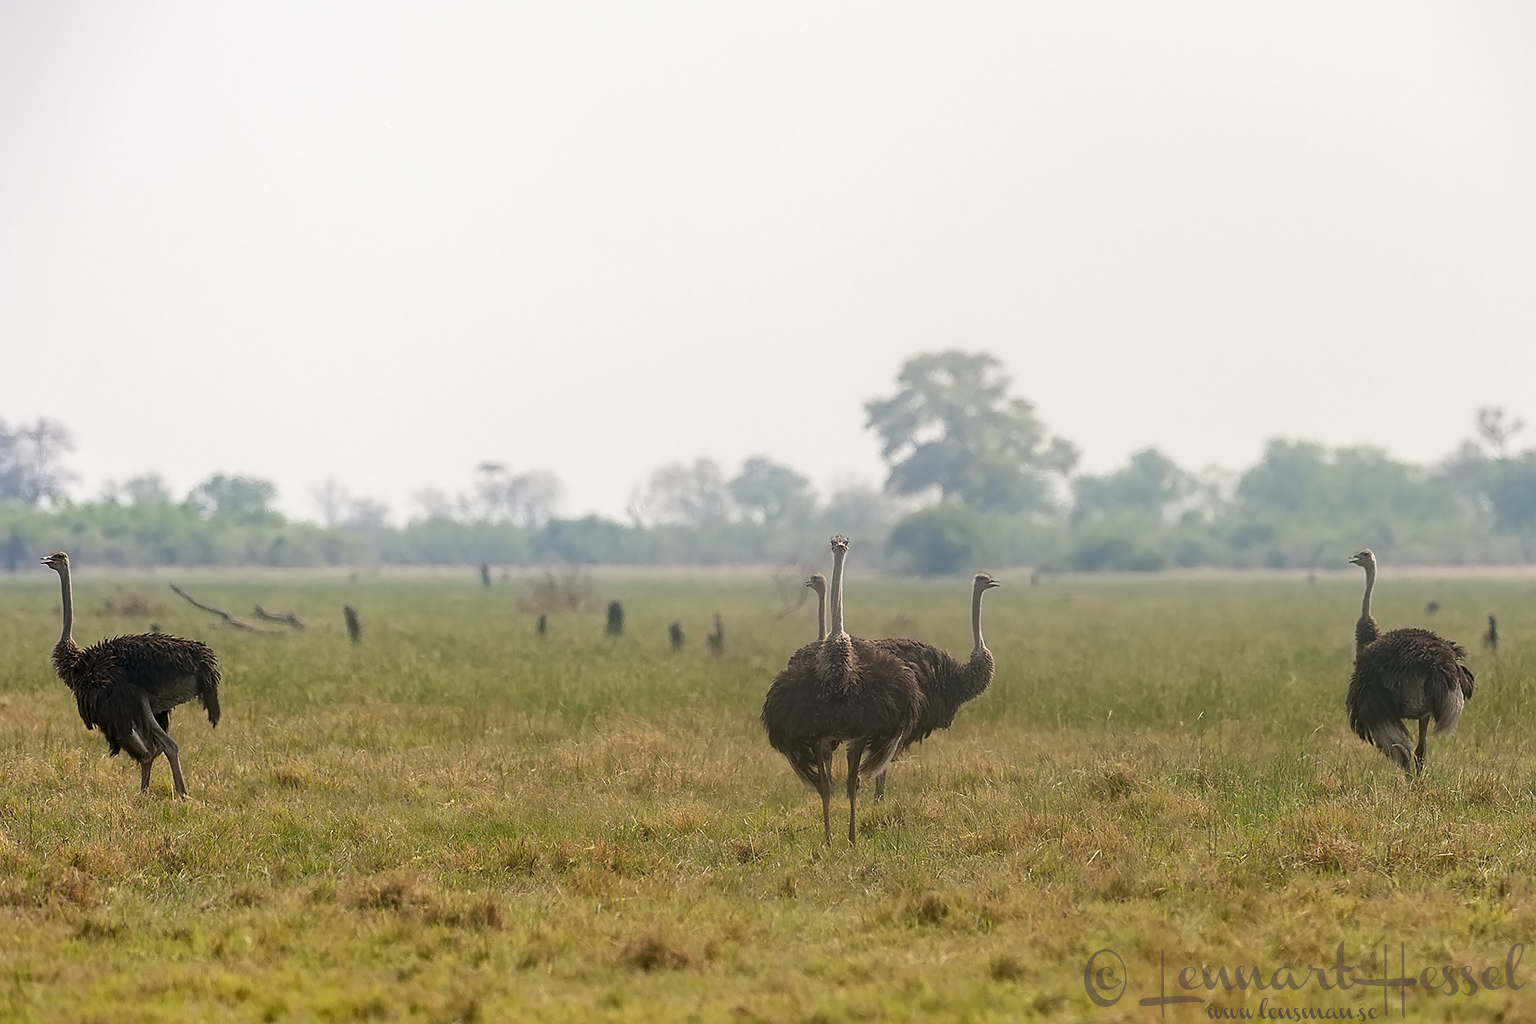 Ostriches in Savuti, Botswana